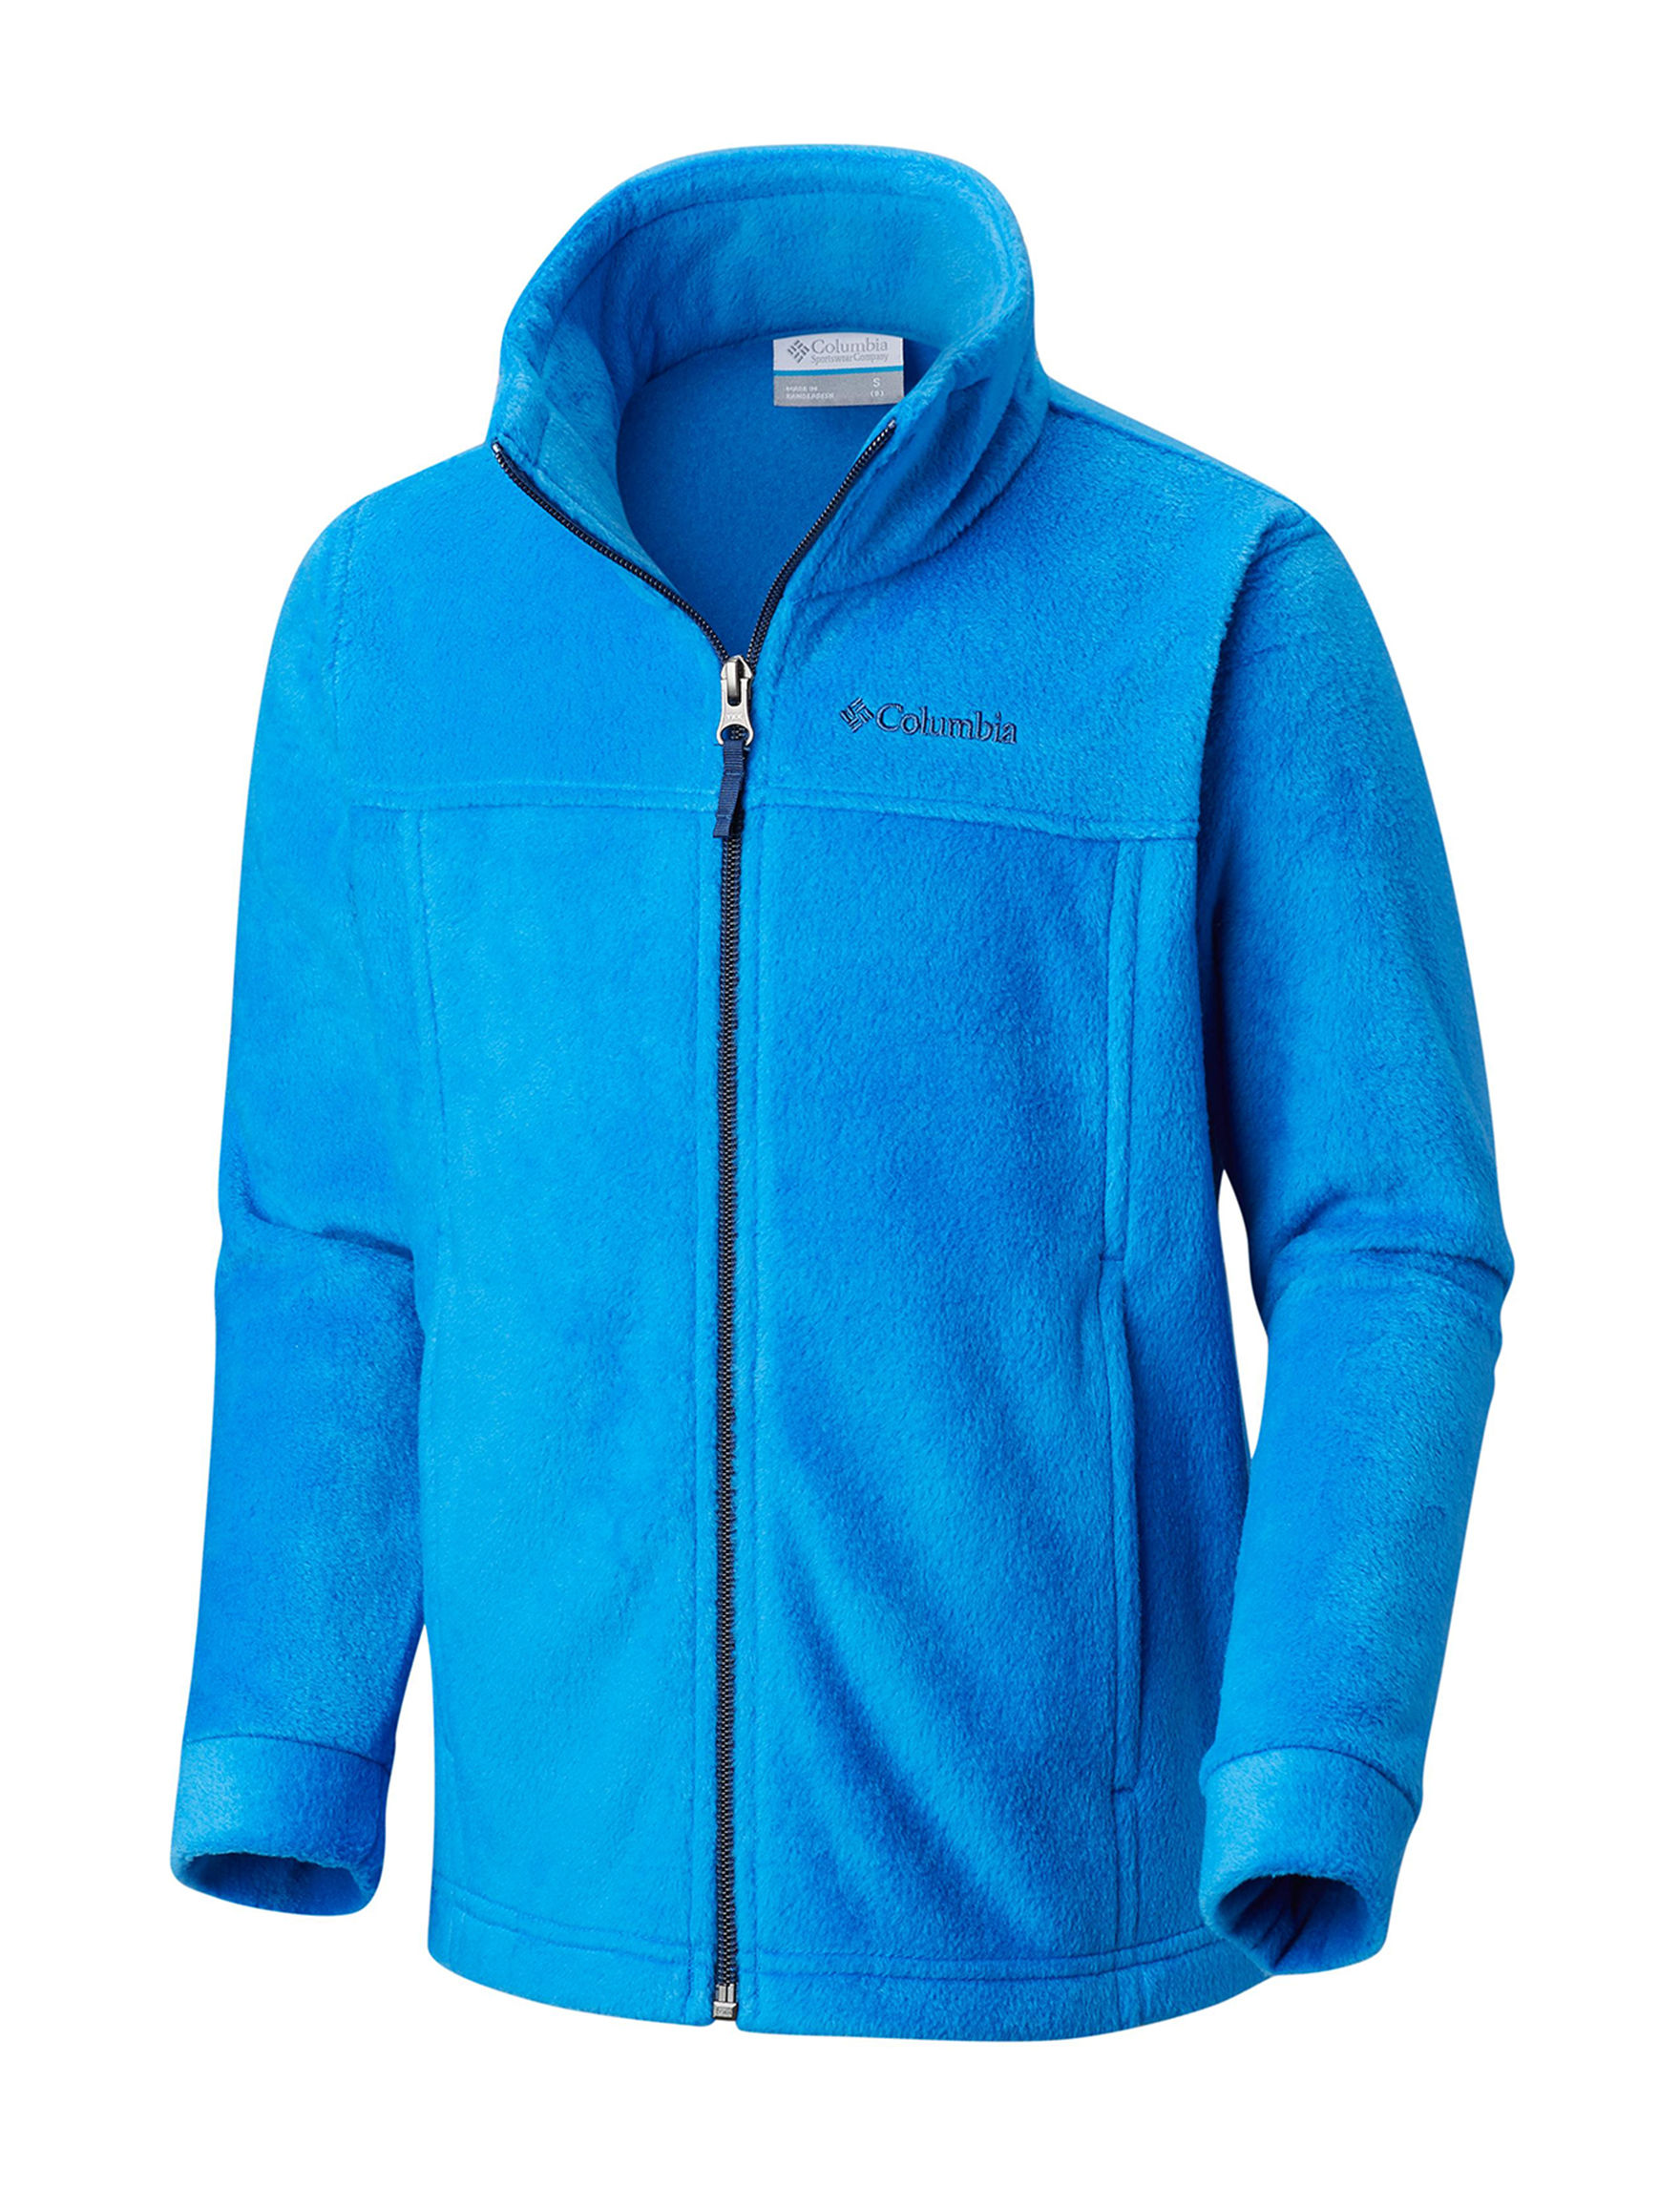 Columbia Blue Fleece & Soft Shell Jackets